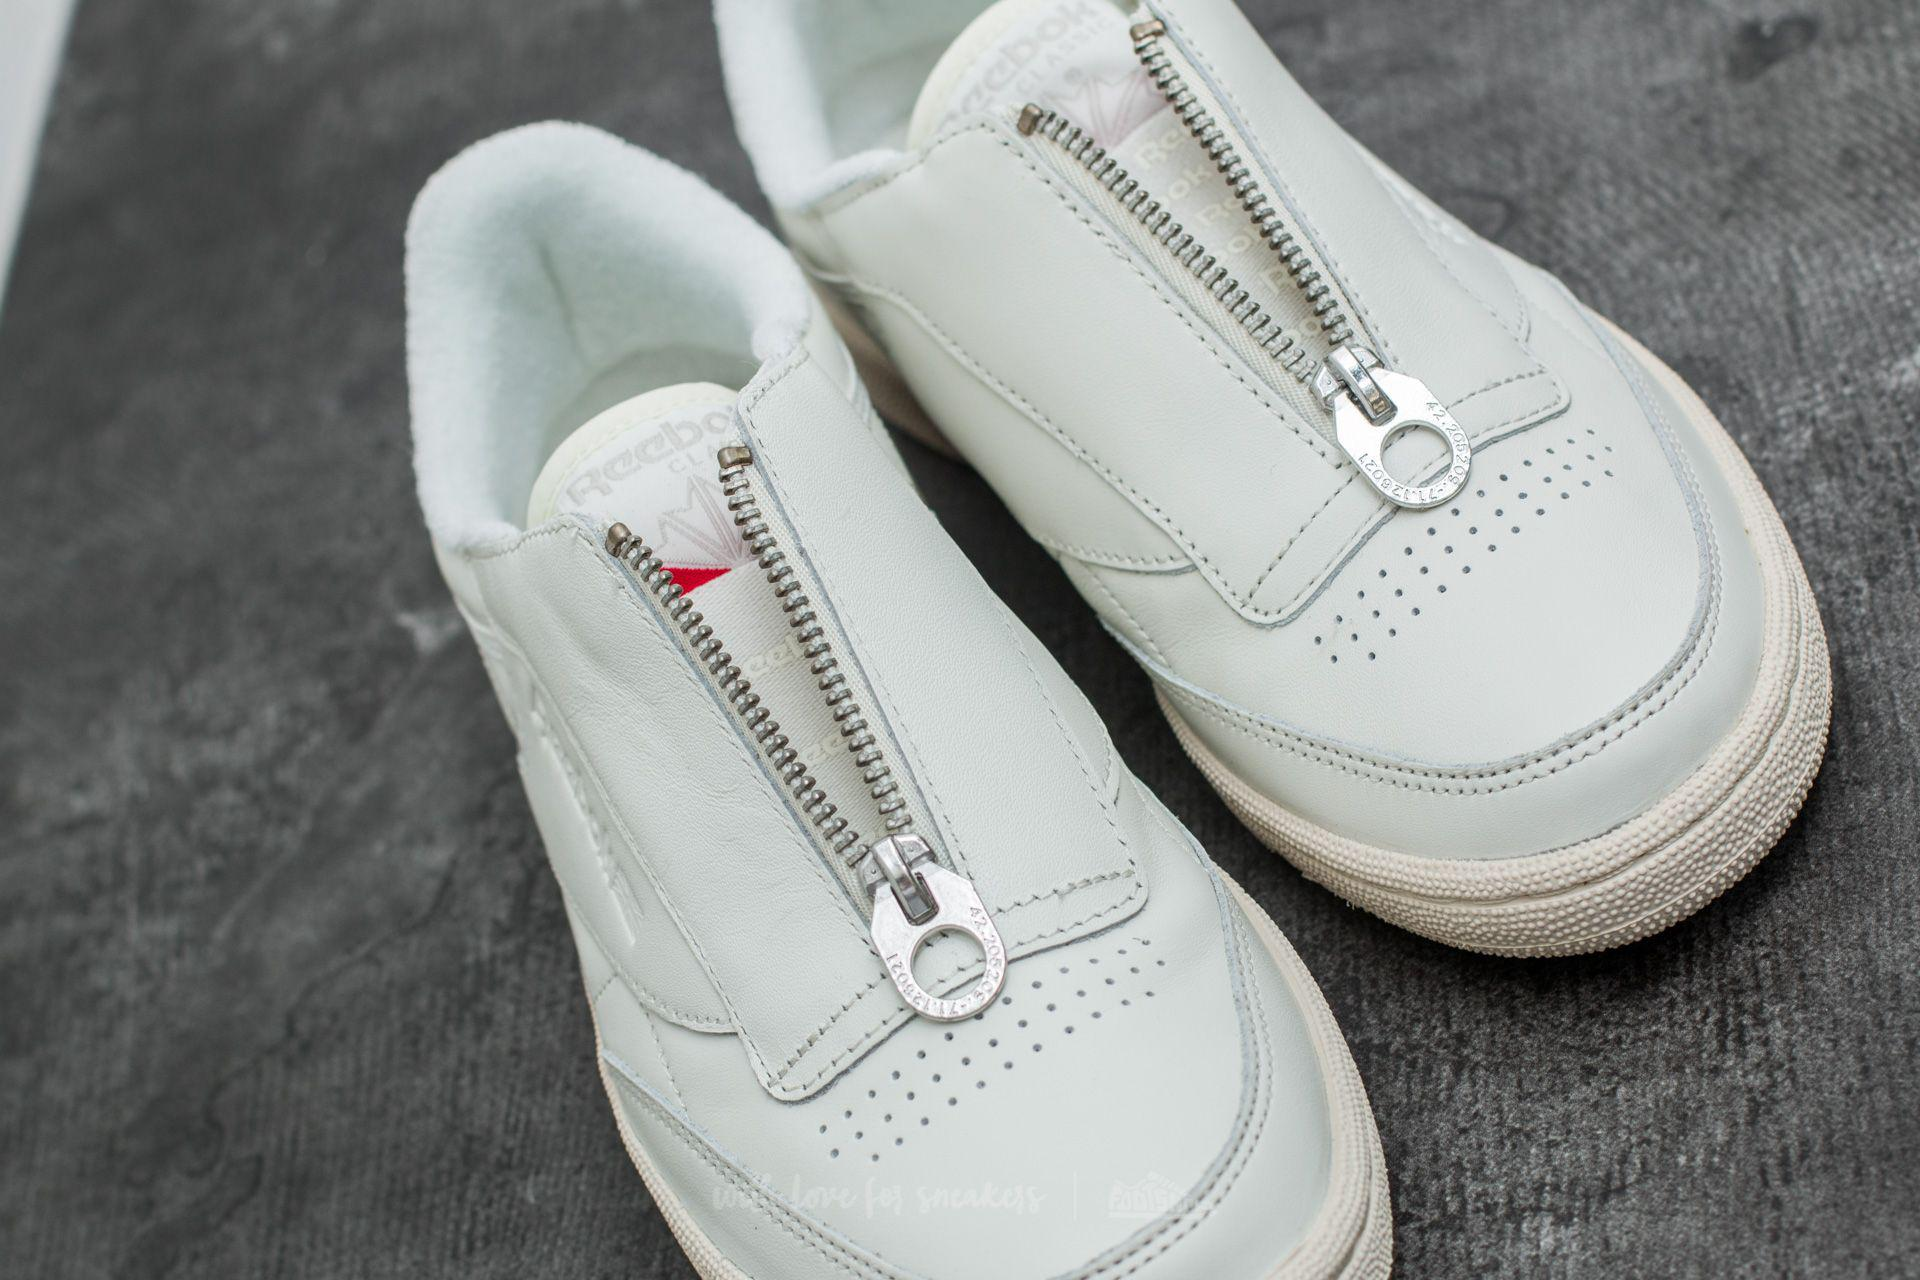 88836525efa862 Lyst - Reebok Club C 85 Zip Chalk  Sandstone  White  Silver